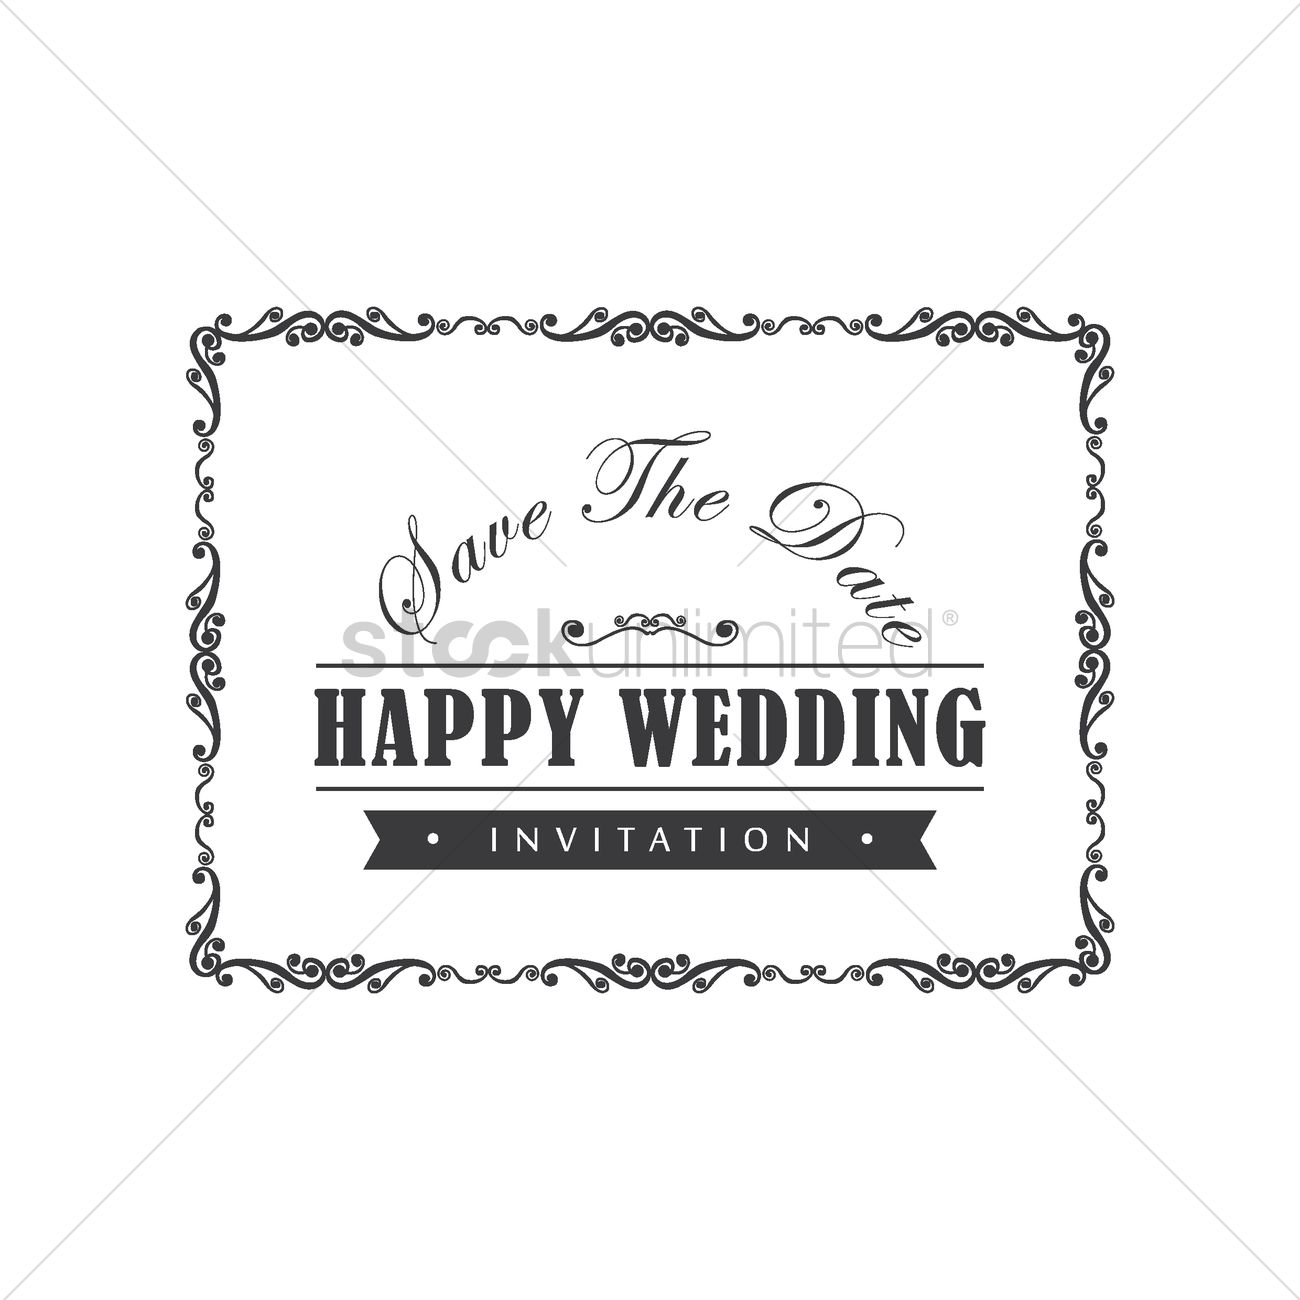 Wedding invitation Vector Image - 1800107 | StockUnlimited